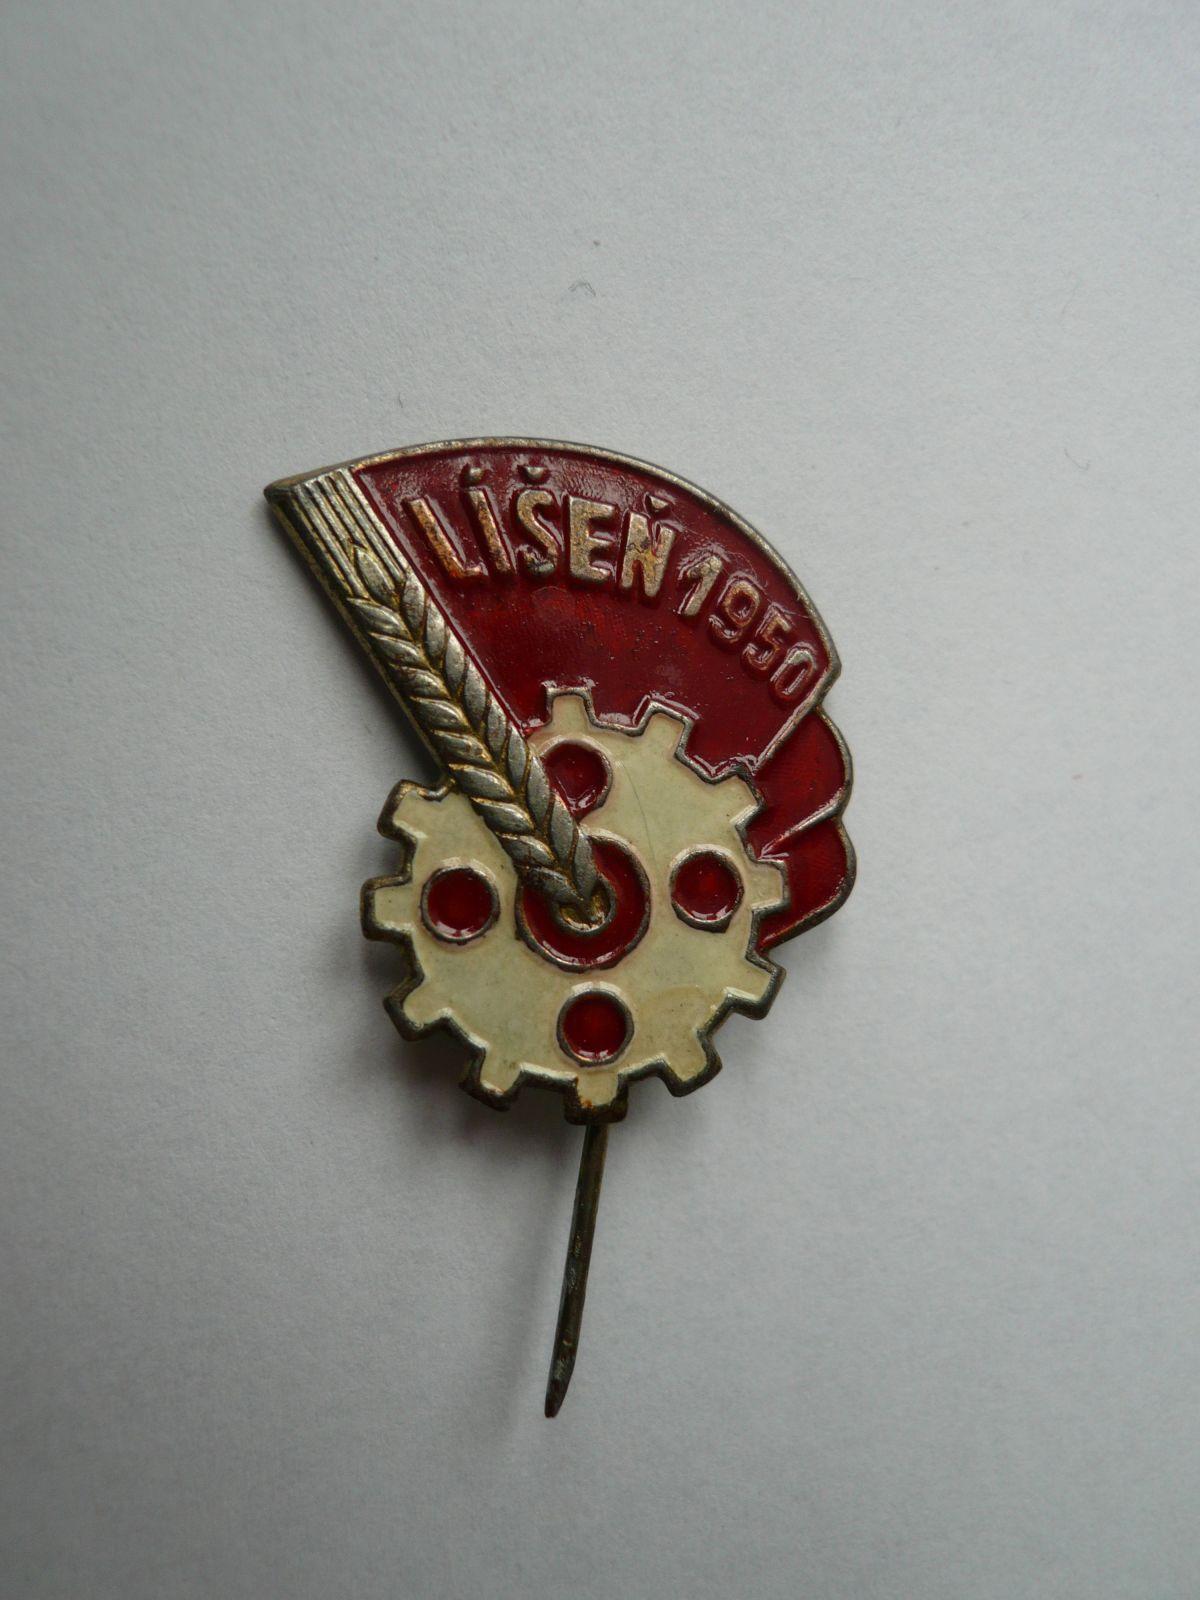 Líšeň 1950, ČSR